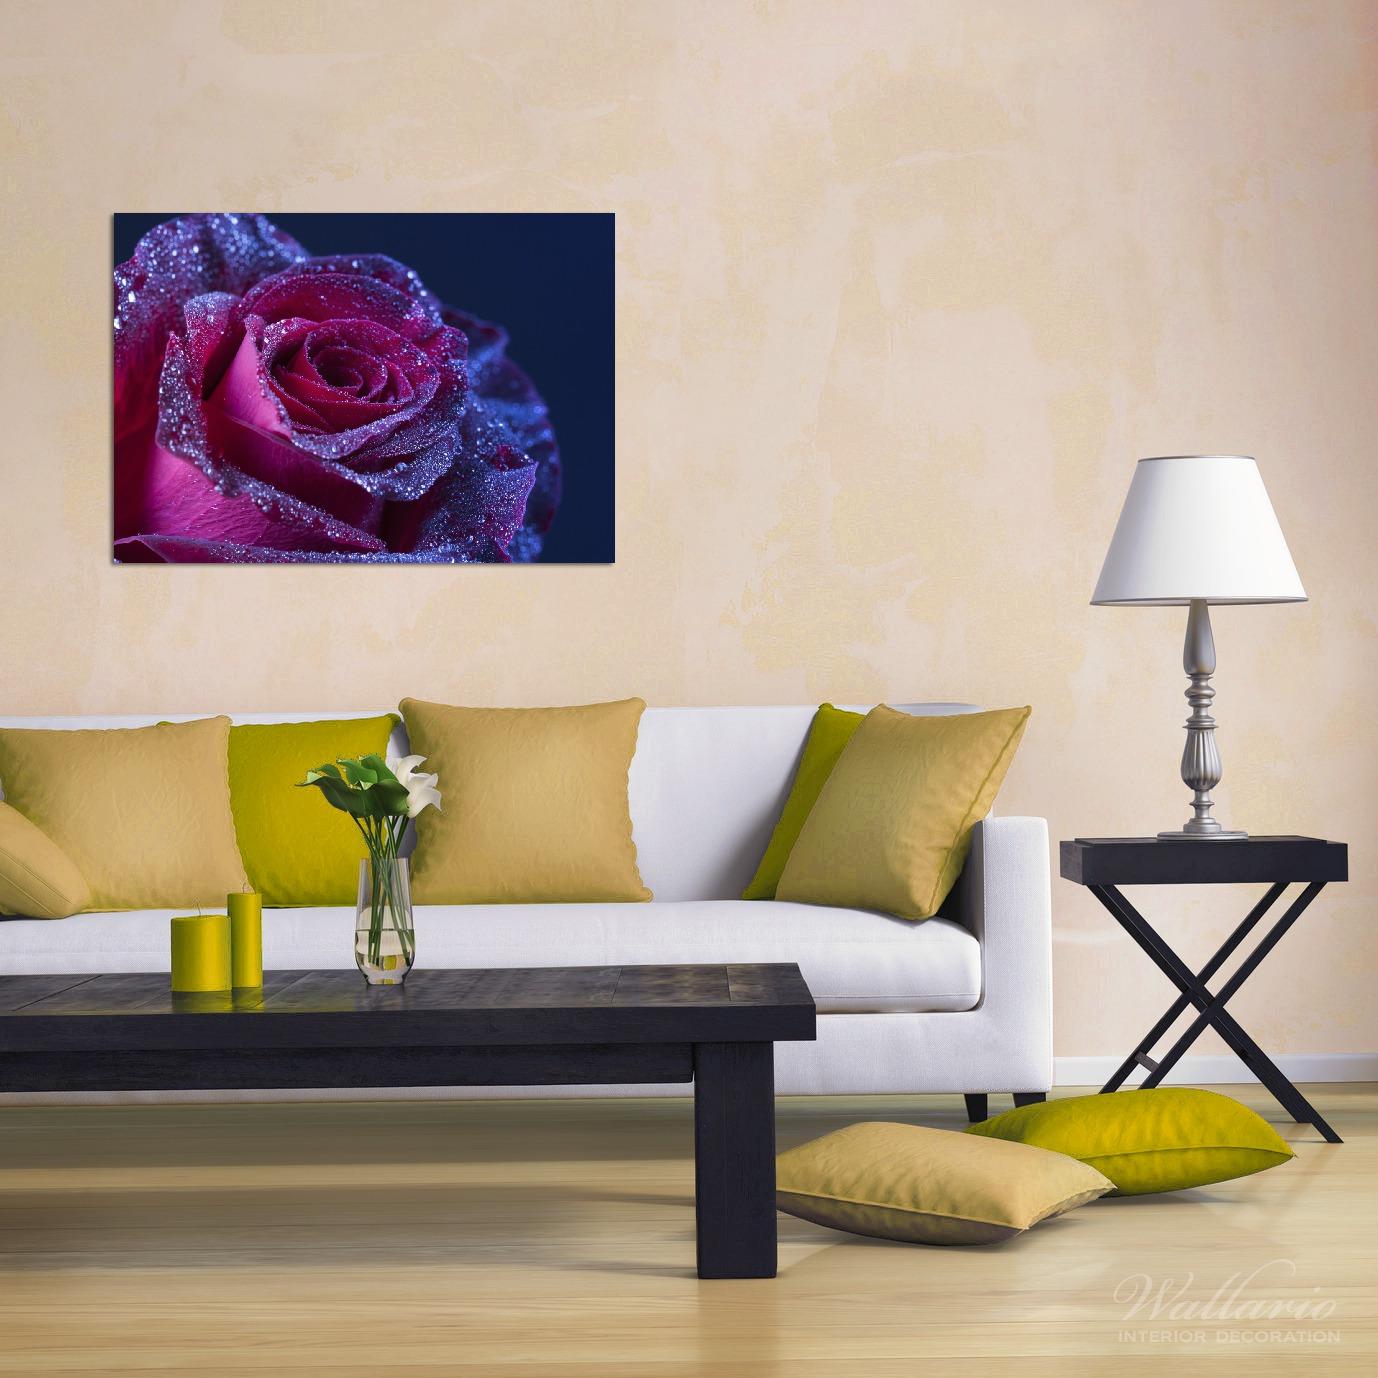 Wandbild Rote Rosenblüte im Regen – Bild 2